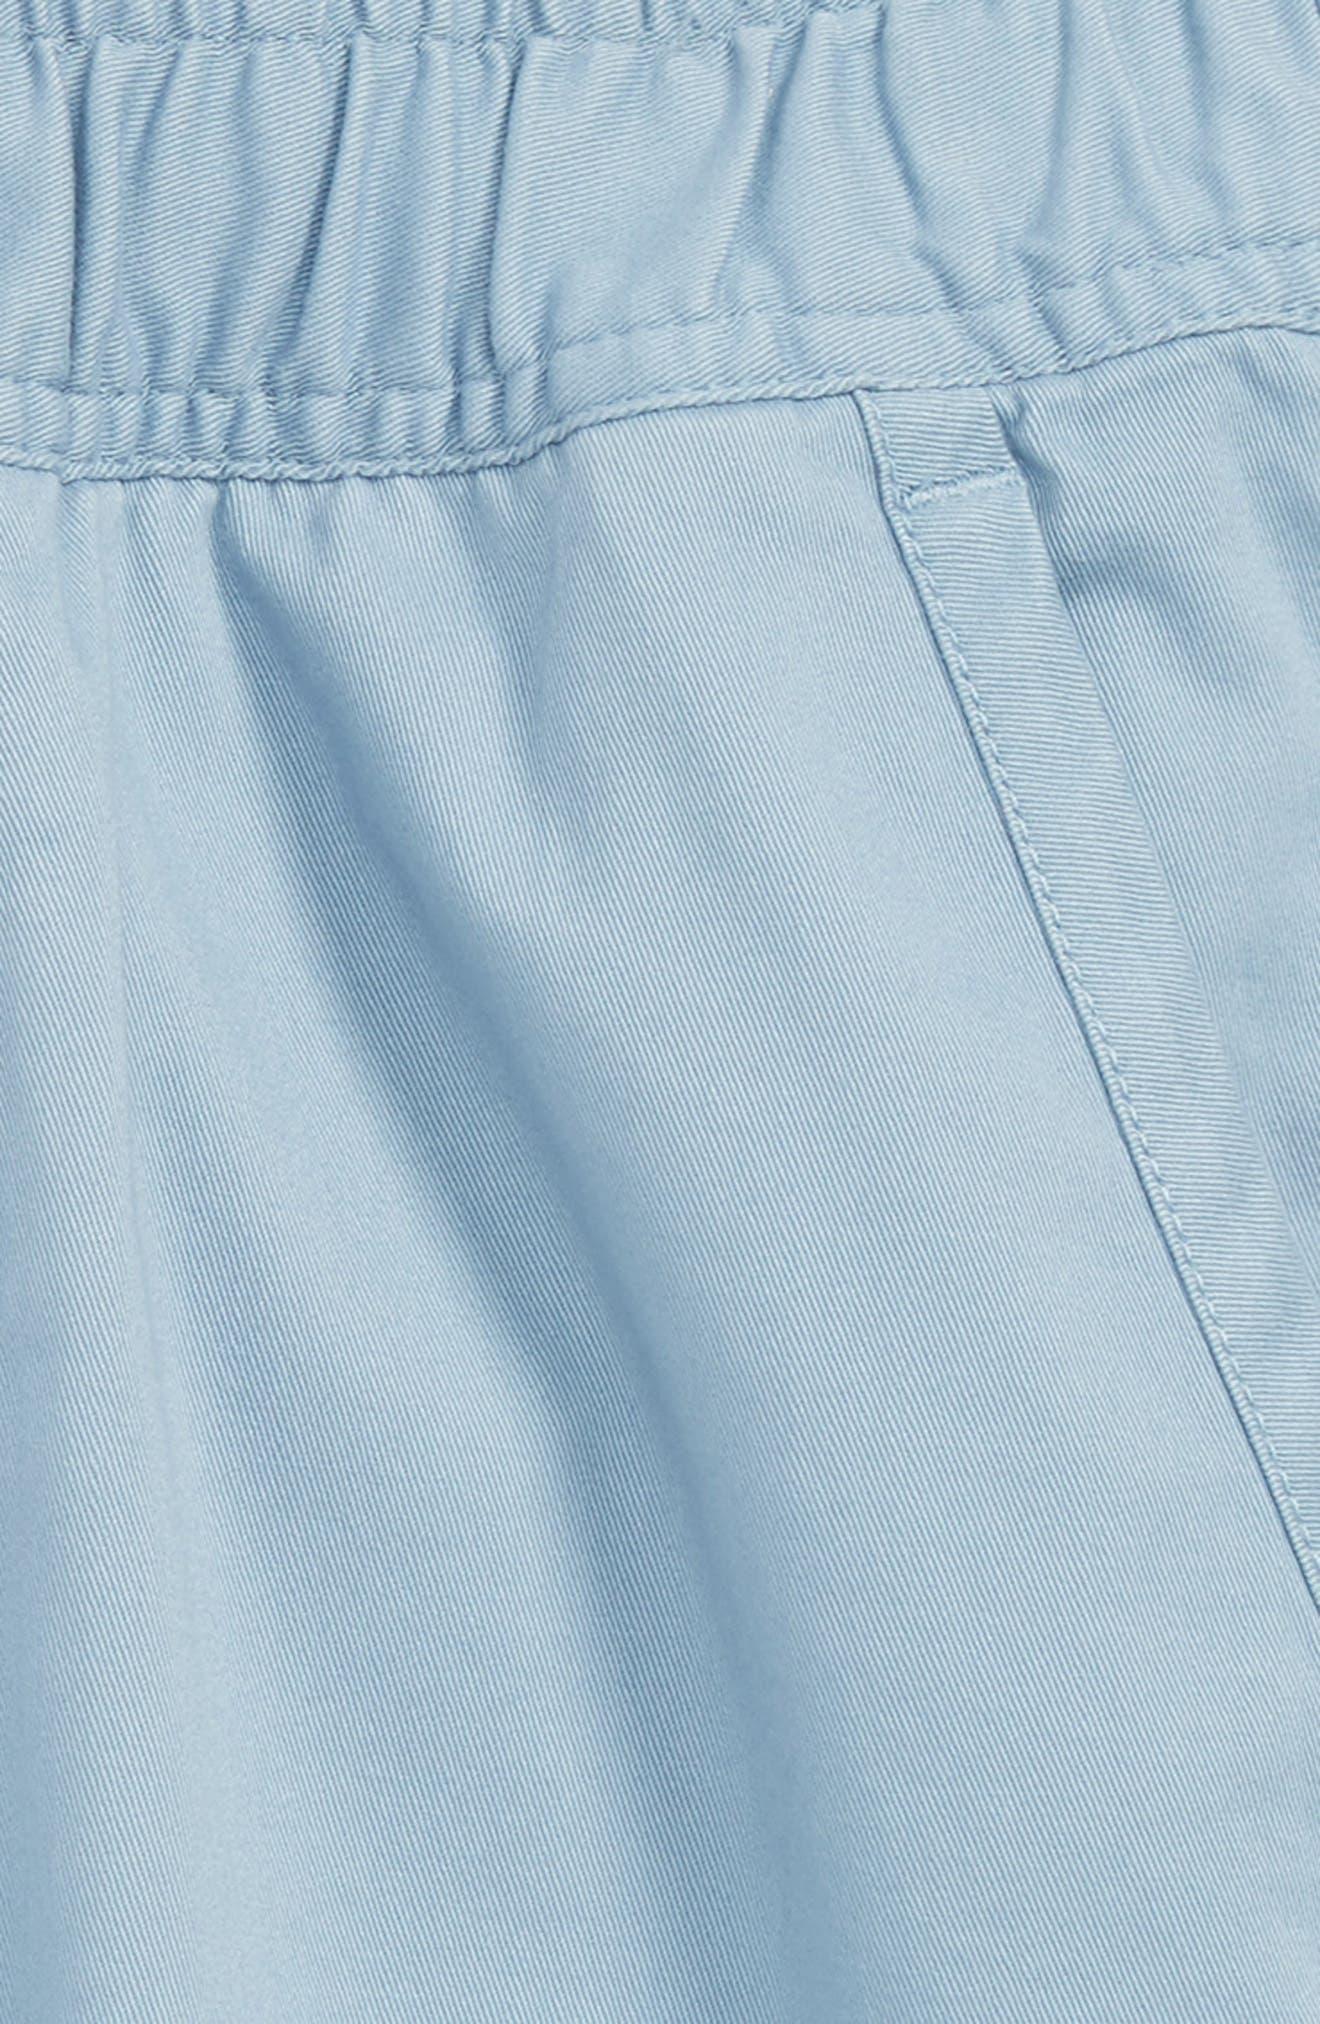 Knit Shorts,                             Alternate thumbnail 2, color,                             Blue Chambray